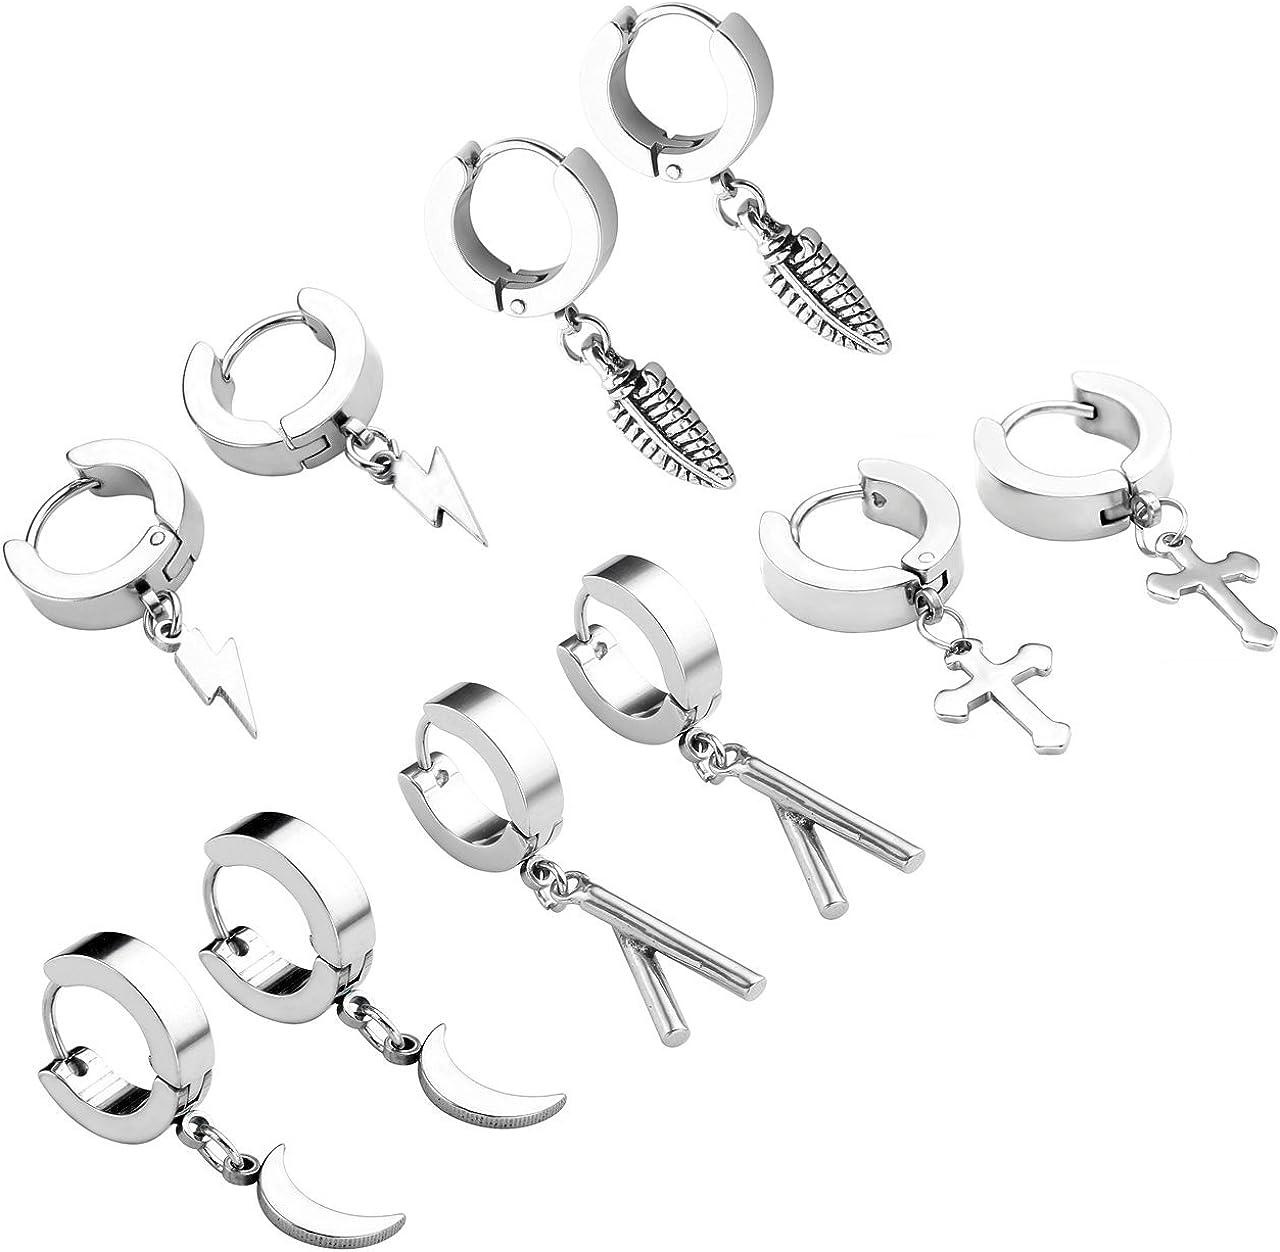 Zysta 5 Pairs Huggie Dangle Earring 18G Cute Sticks Corss Feathers Flash Moon Shape Mini Charms Stainless Steel Hoop Ear Studs